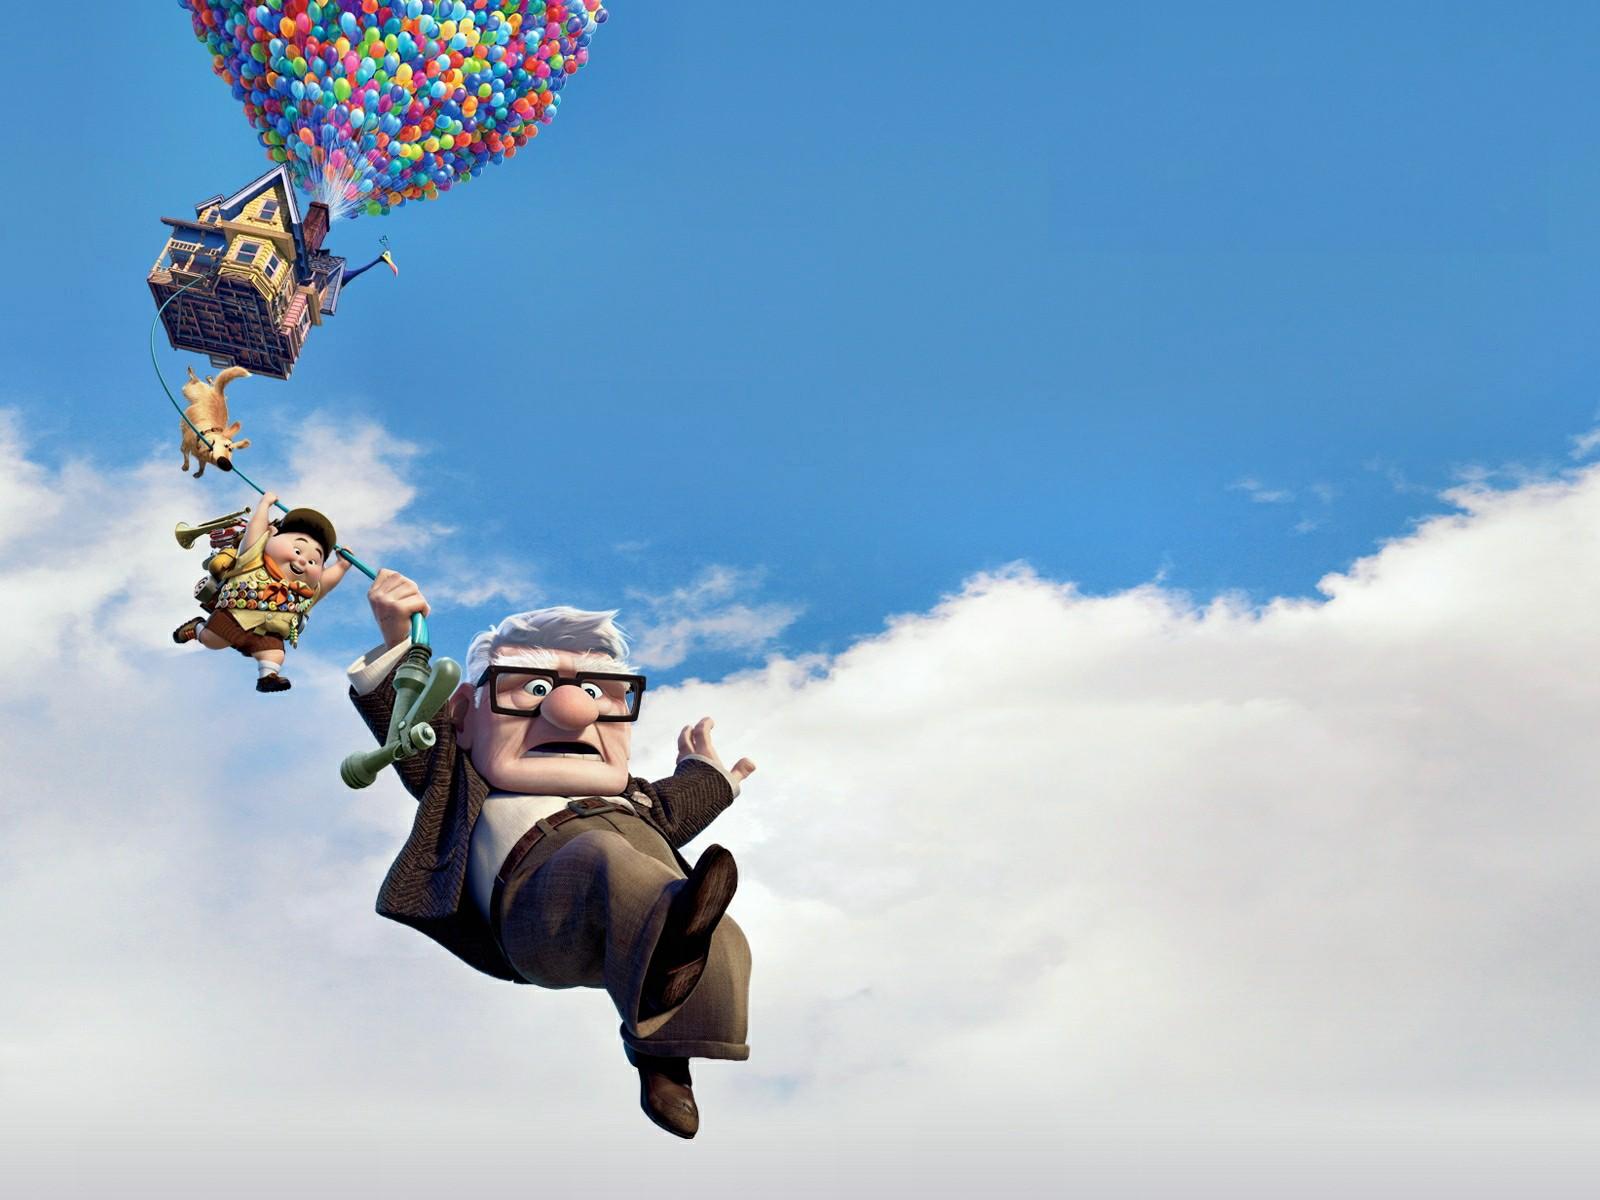 21 Awesome Air Balloon Wallpapers Gambar Lucu Aneh Dan Unik